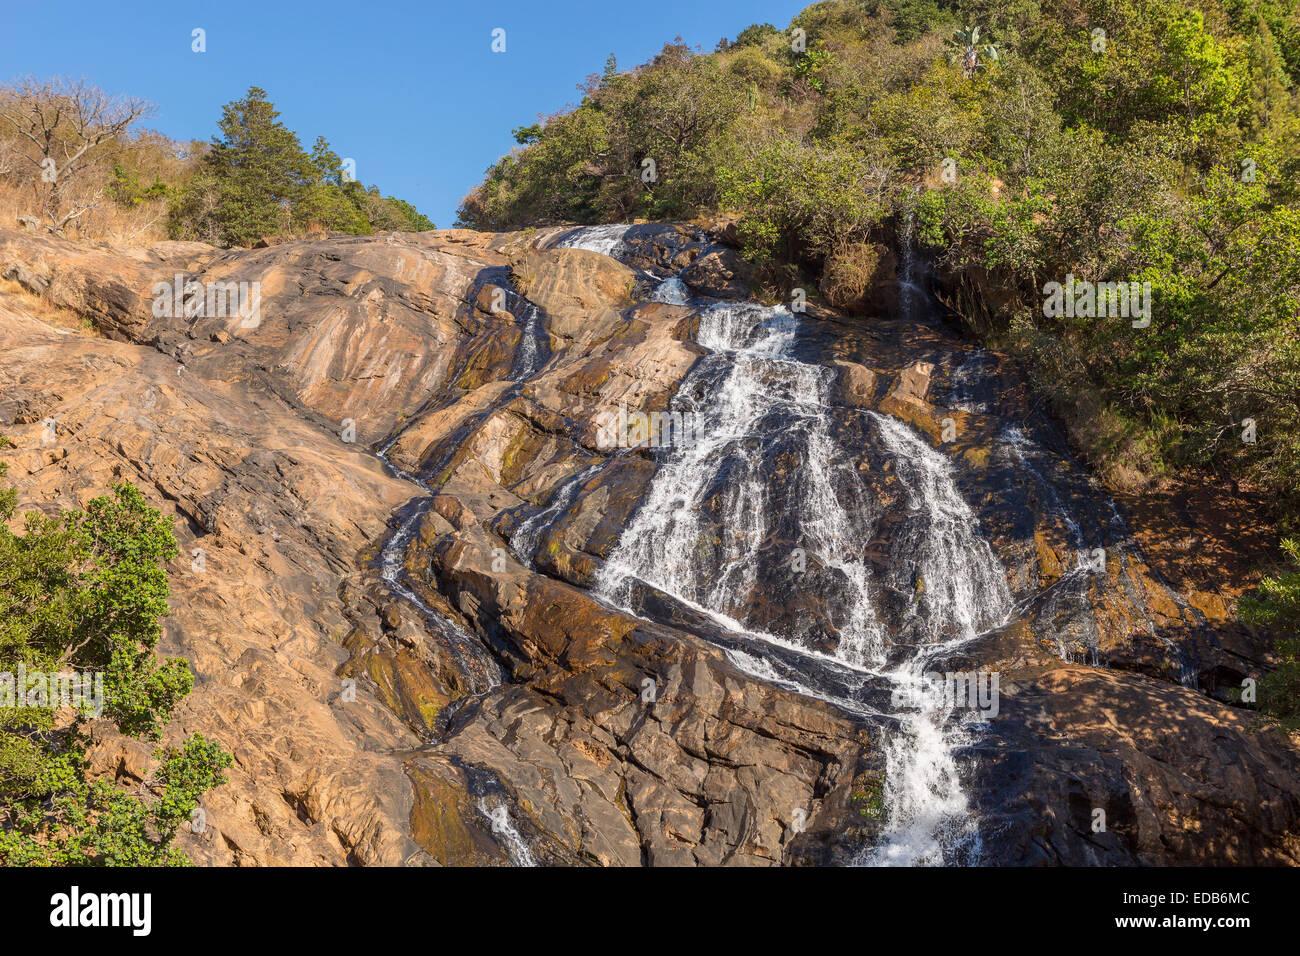 HHOHHO, SWAZILAND, AFRICA - Phophonyane Nature Reserve waterfall. Stock Photo